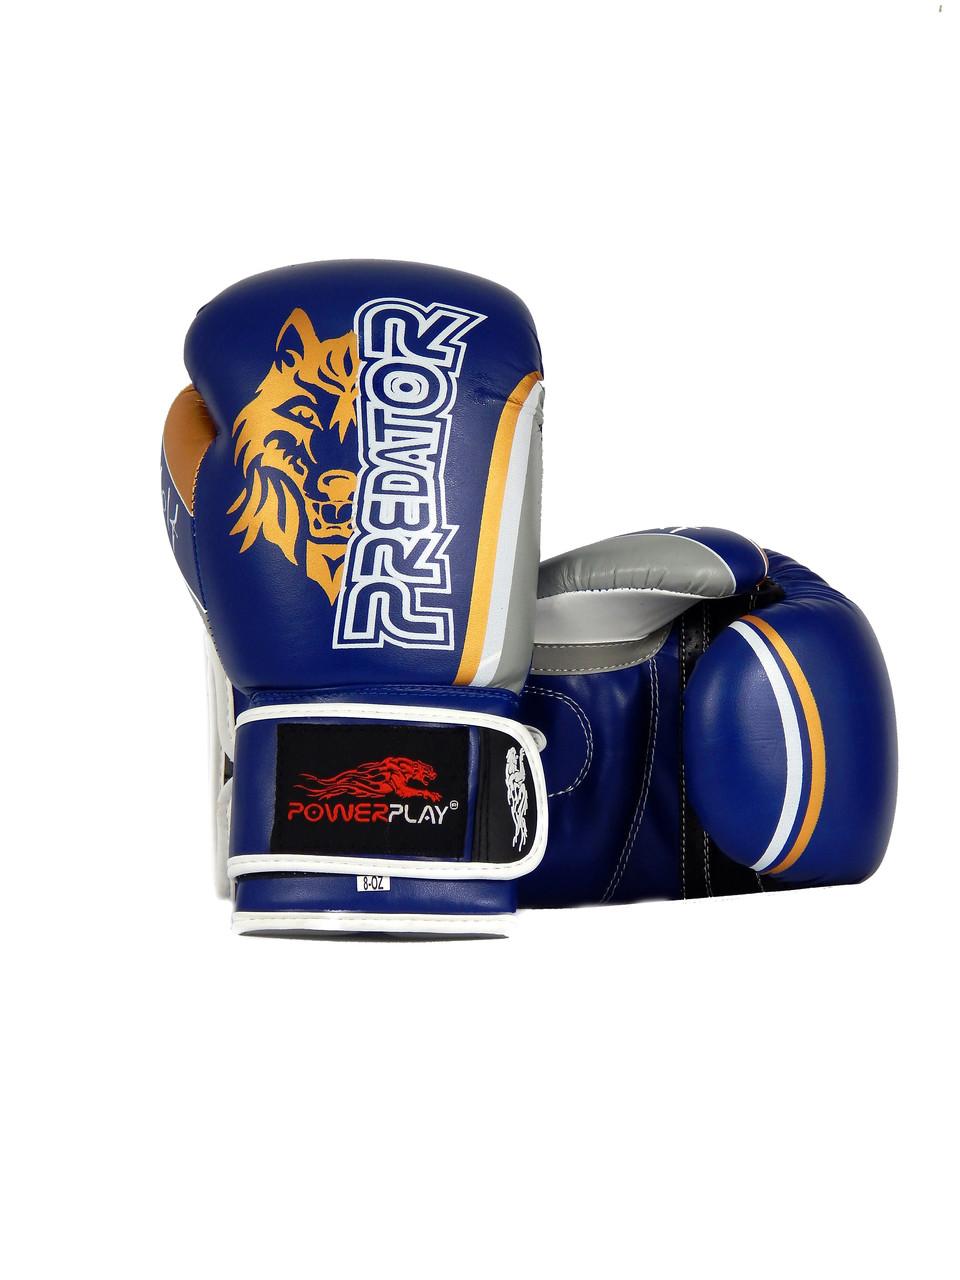 Боксерские перчатки PowerPlay 3005 синие 8 унций